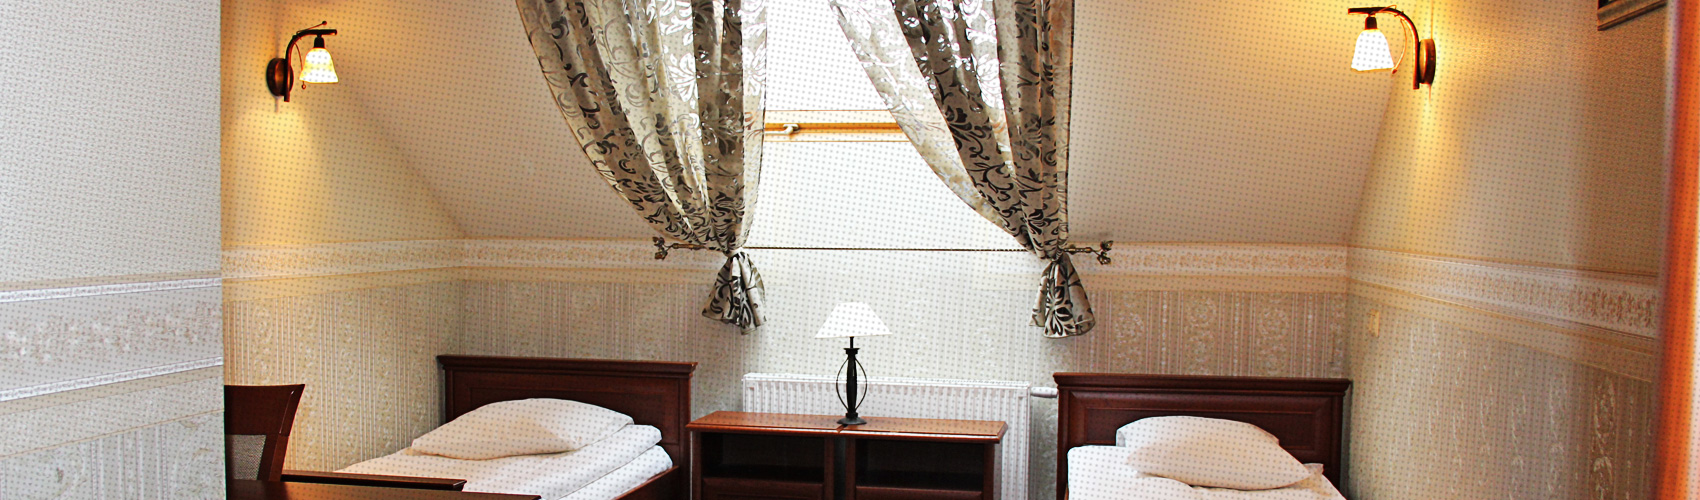 Guest House Senoji Užeiga